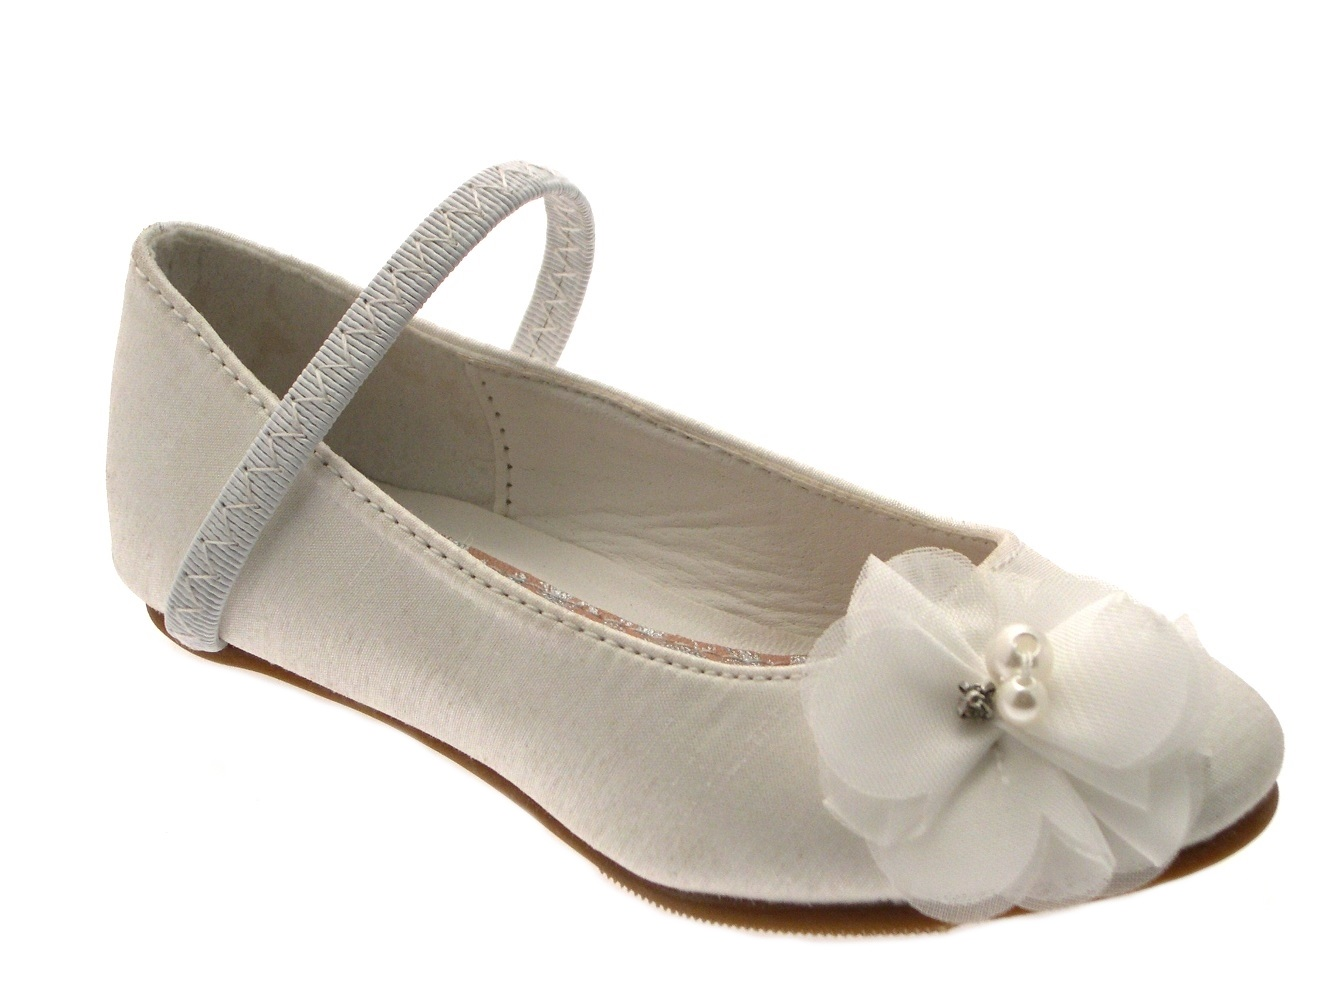 Kids High Heels Formal Wedding Shoes Open Toe Party Sandals Flower